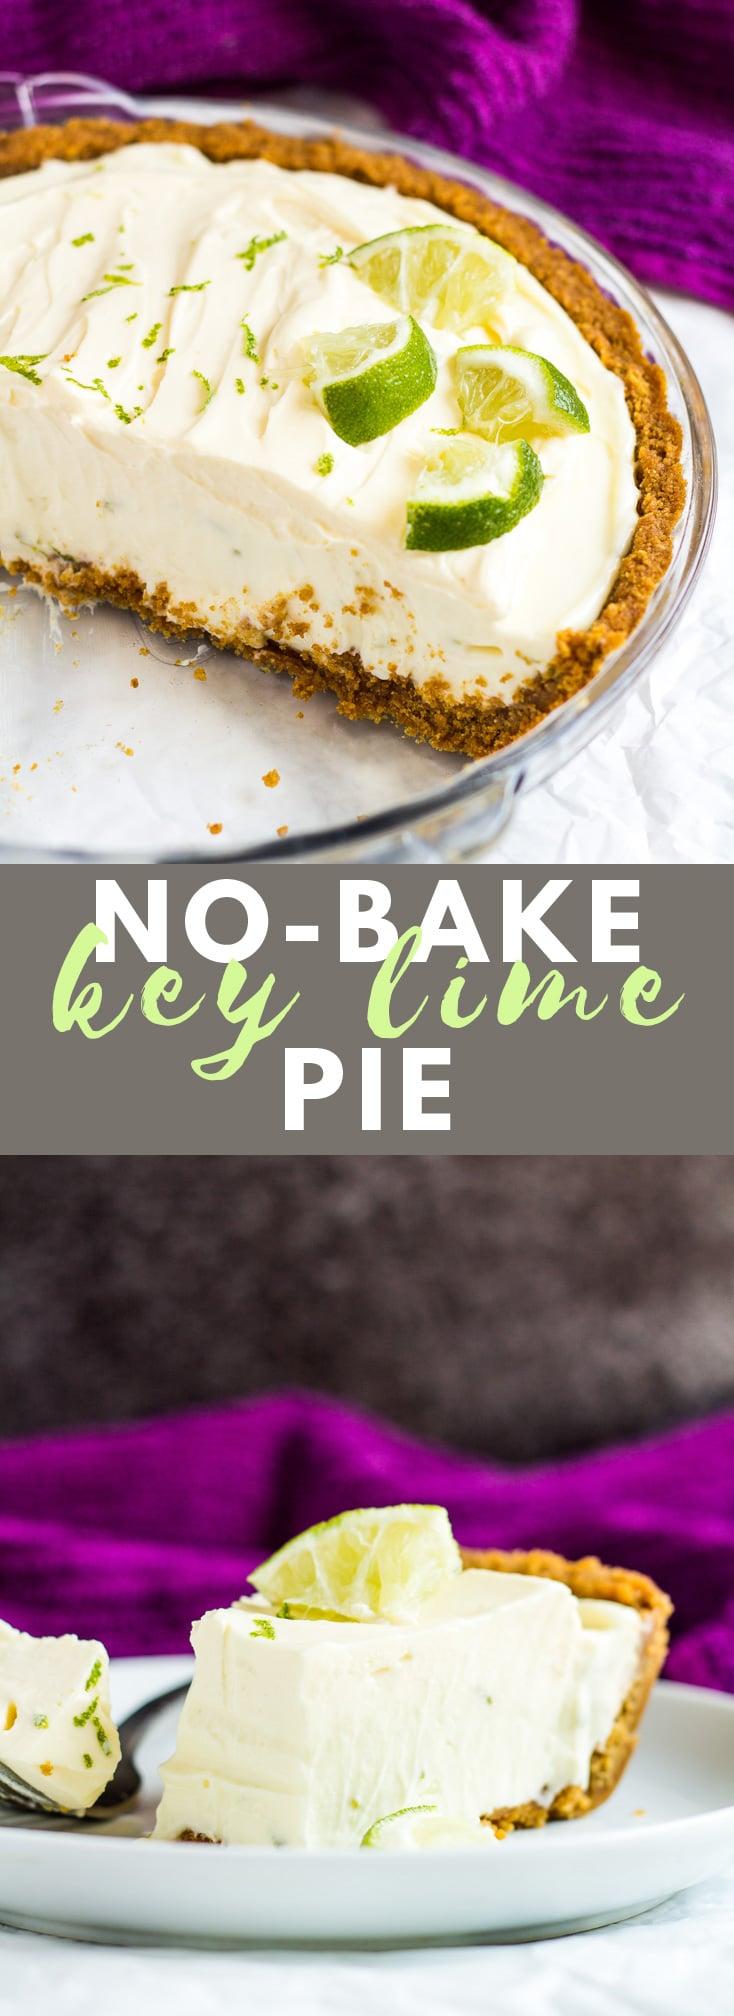 No-Bake Key Lime Pie | Marsha's Baking Addiction